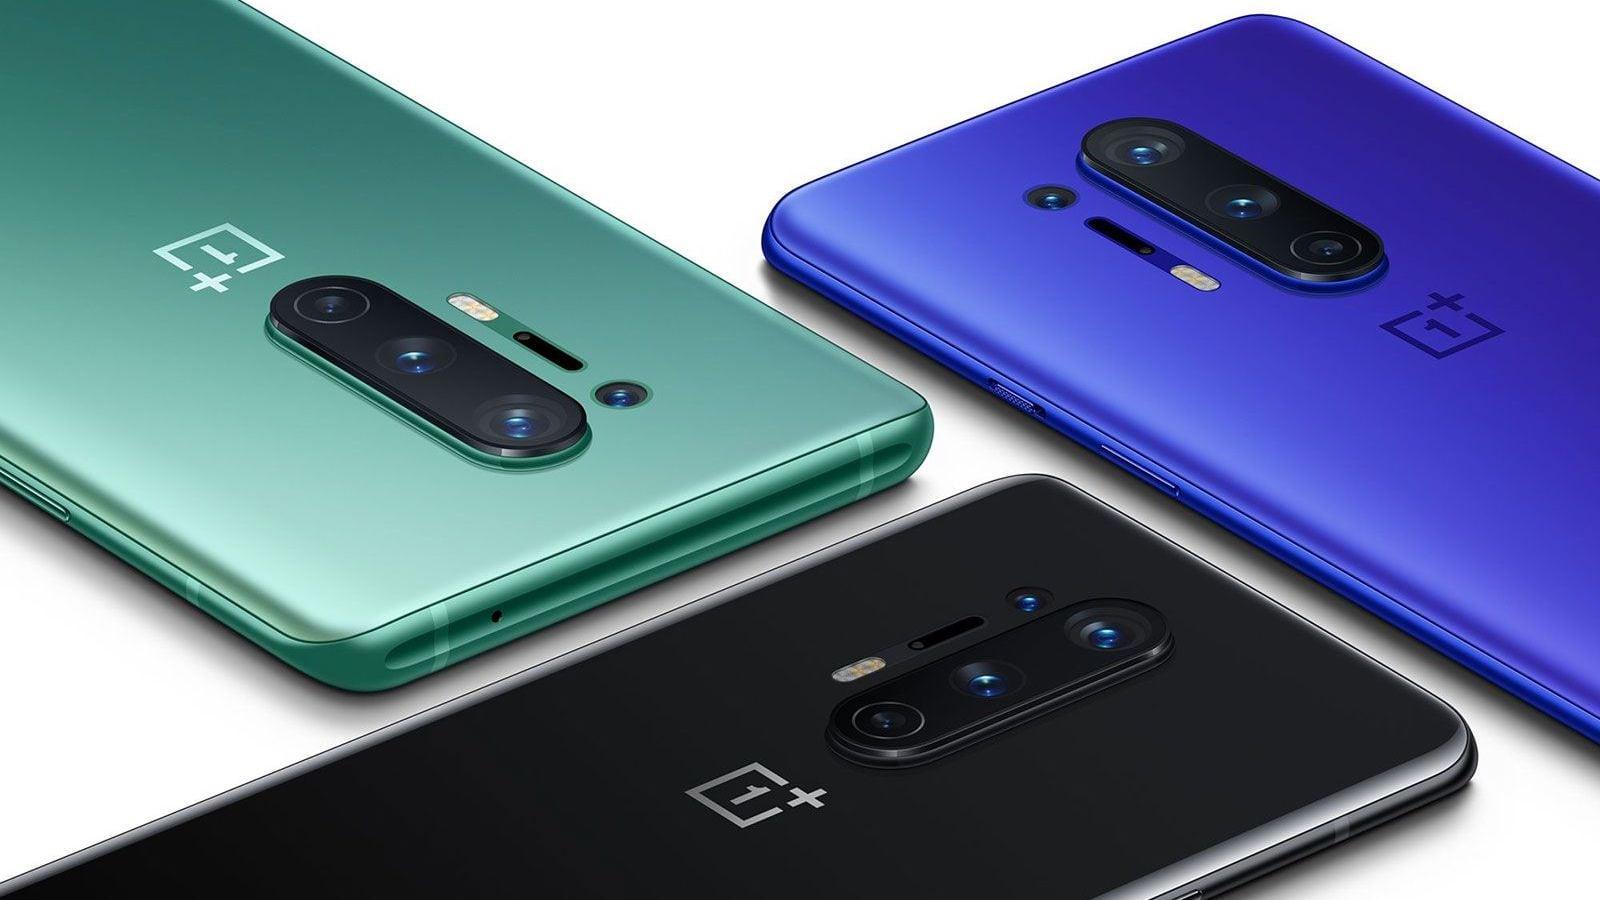 OnePlus 8 Pro 5G Smartphone